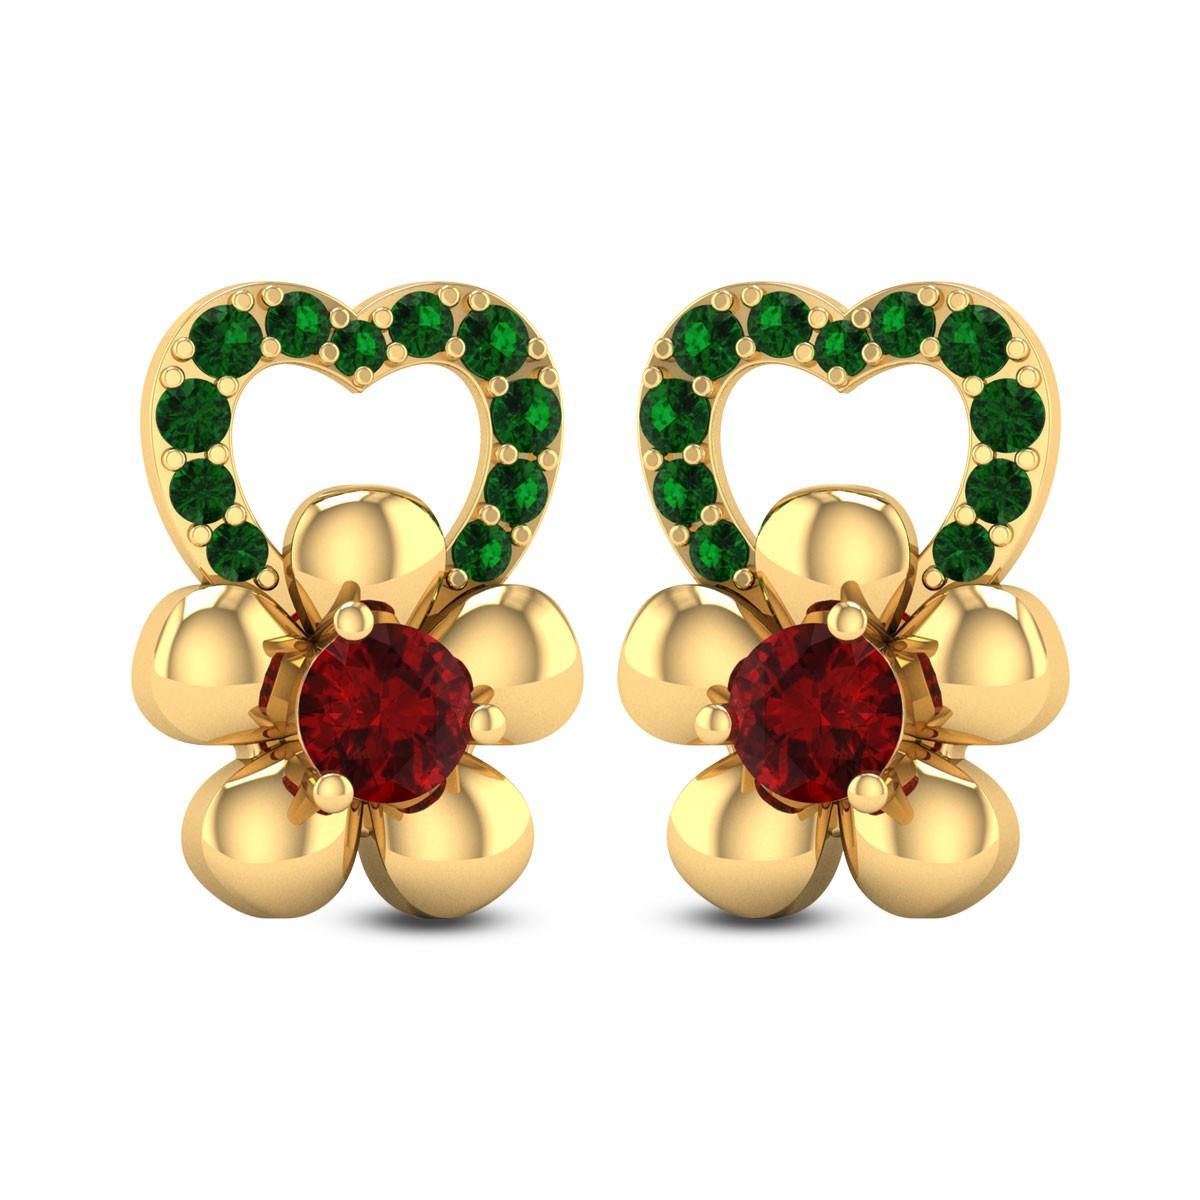 Floral Heart Stud Earrings